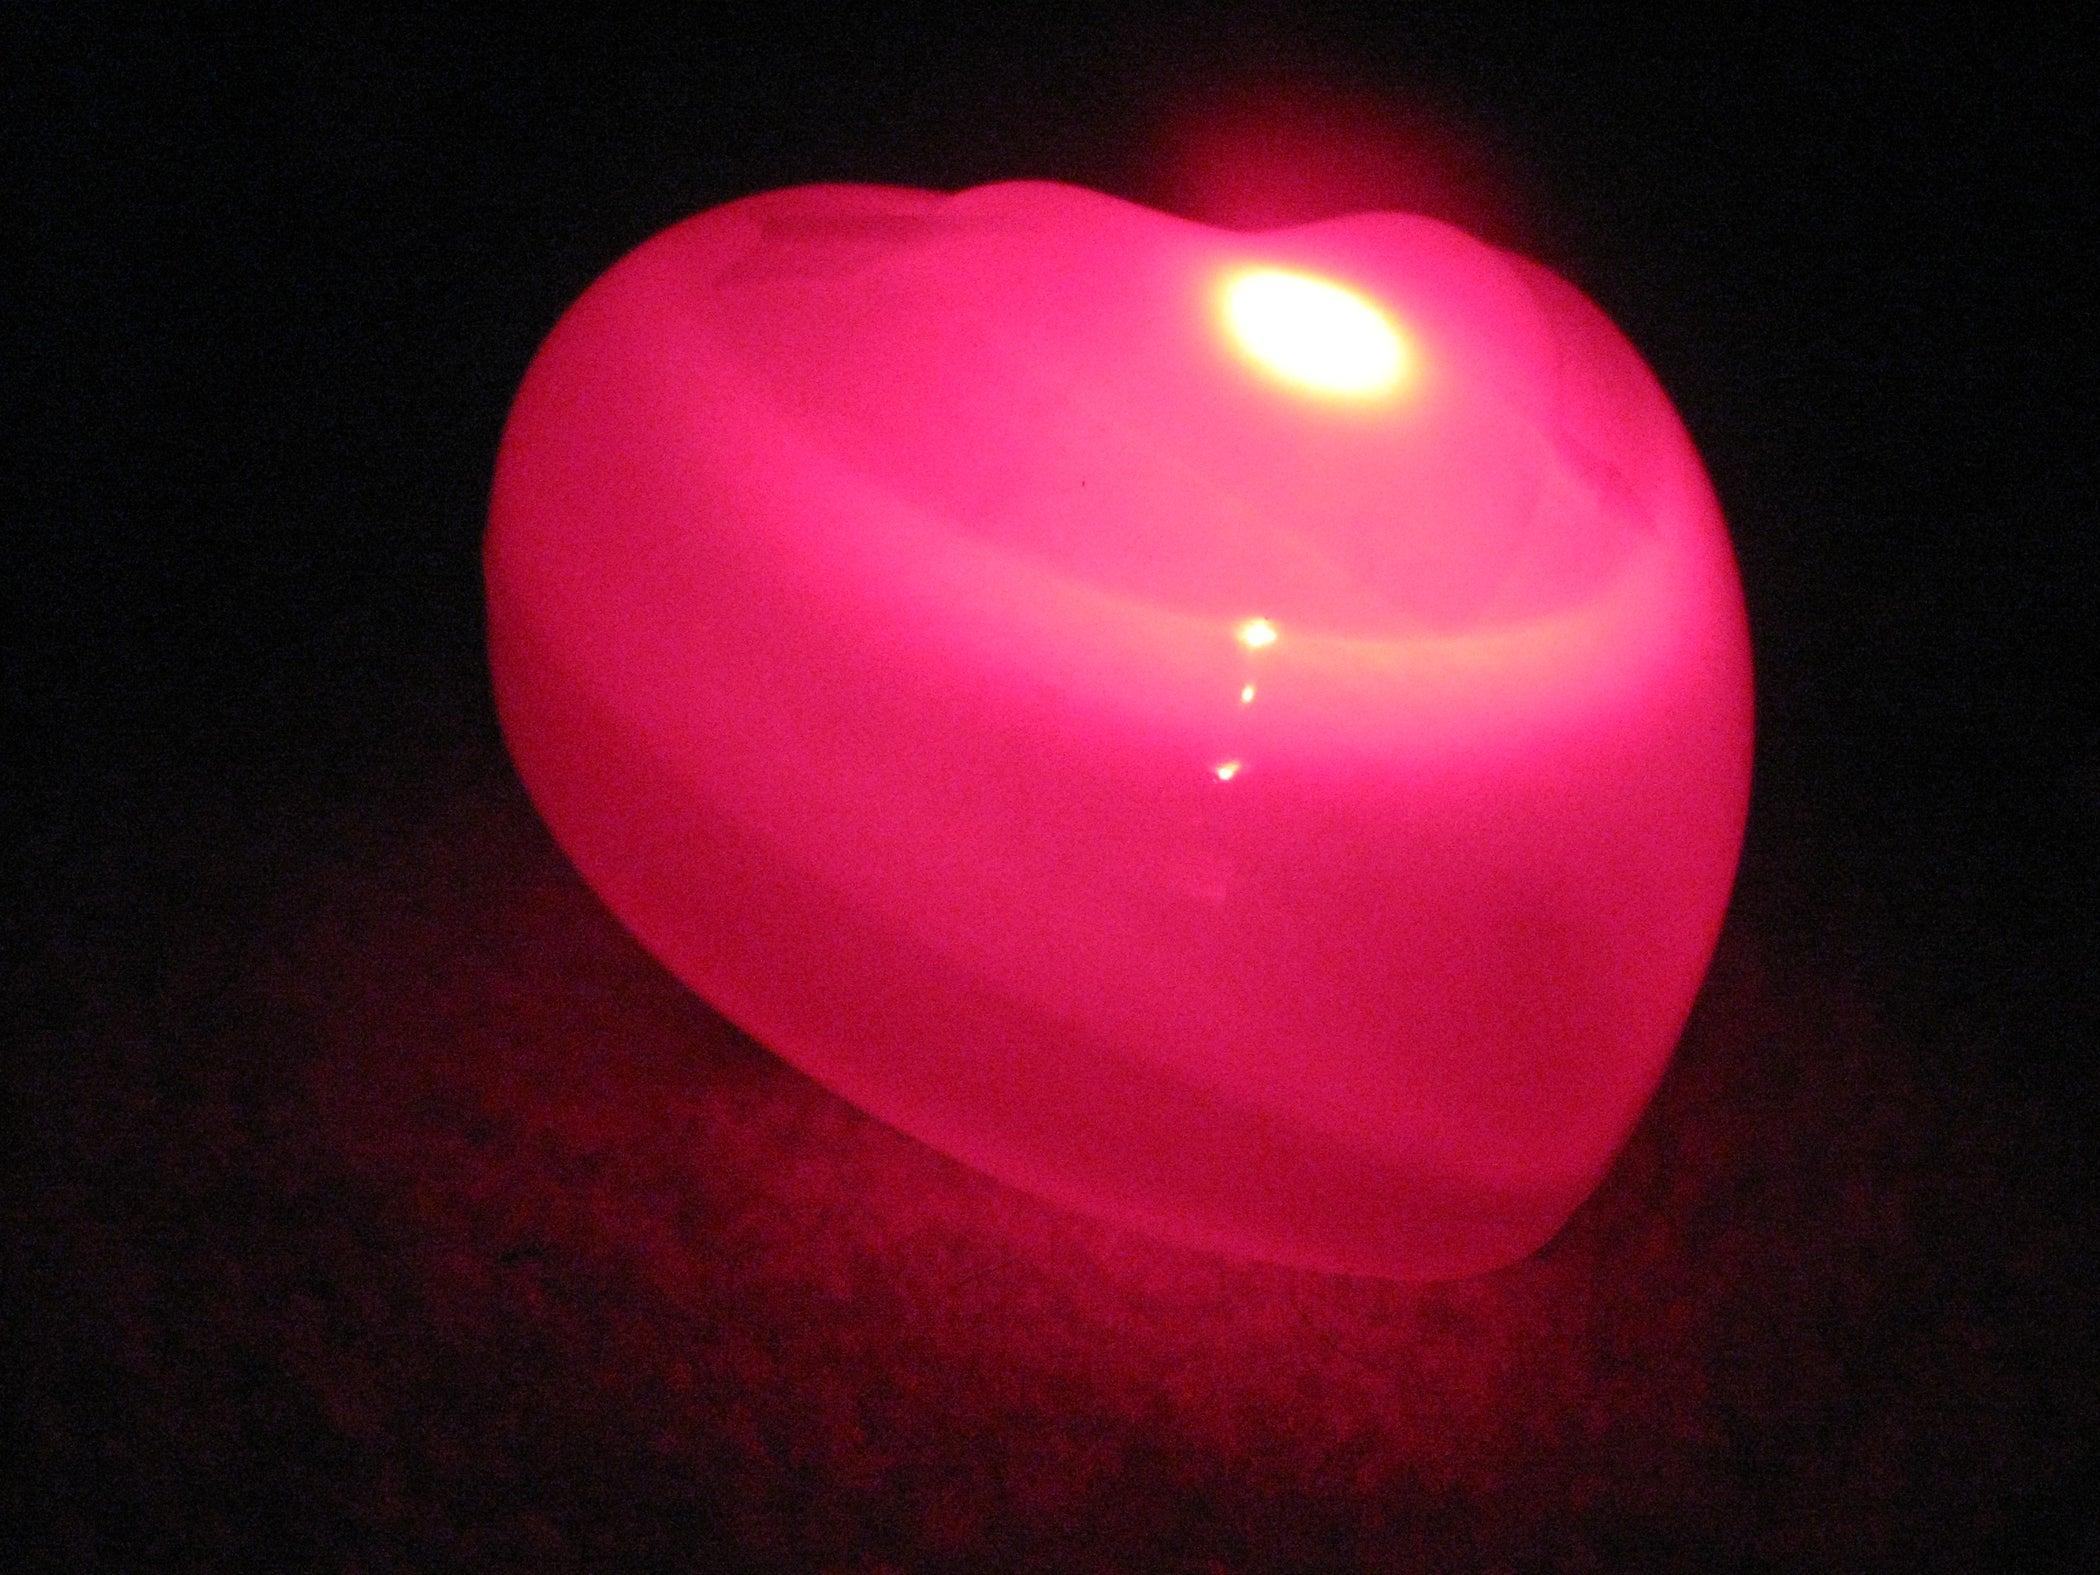 Glowing Led Heart Light  6 Steps